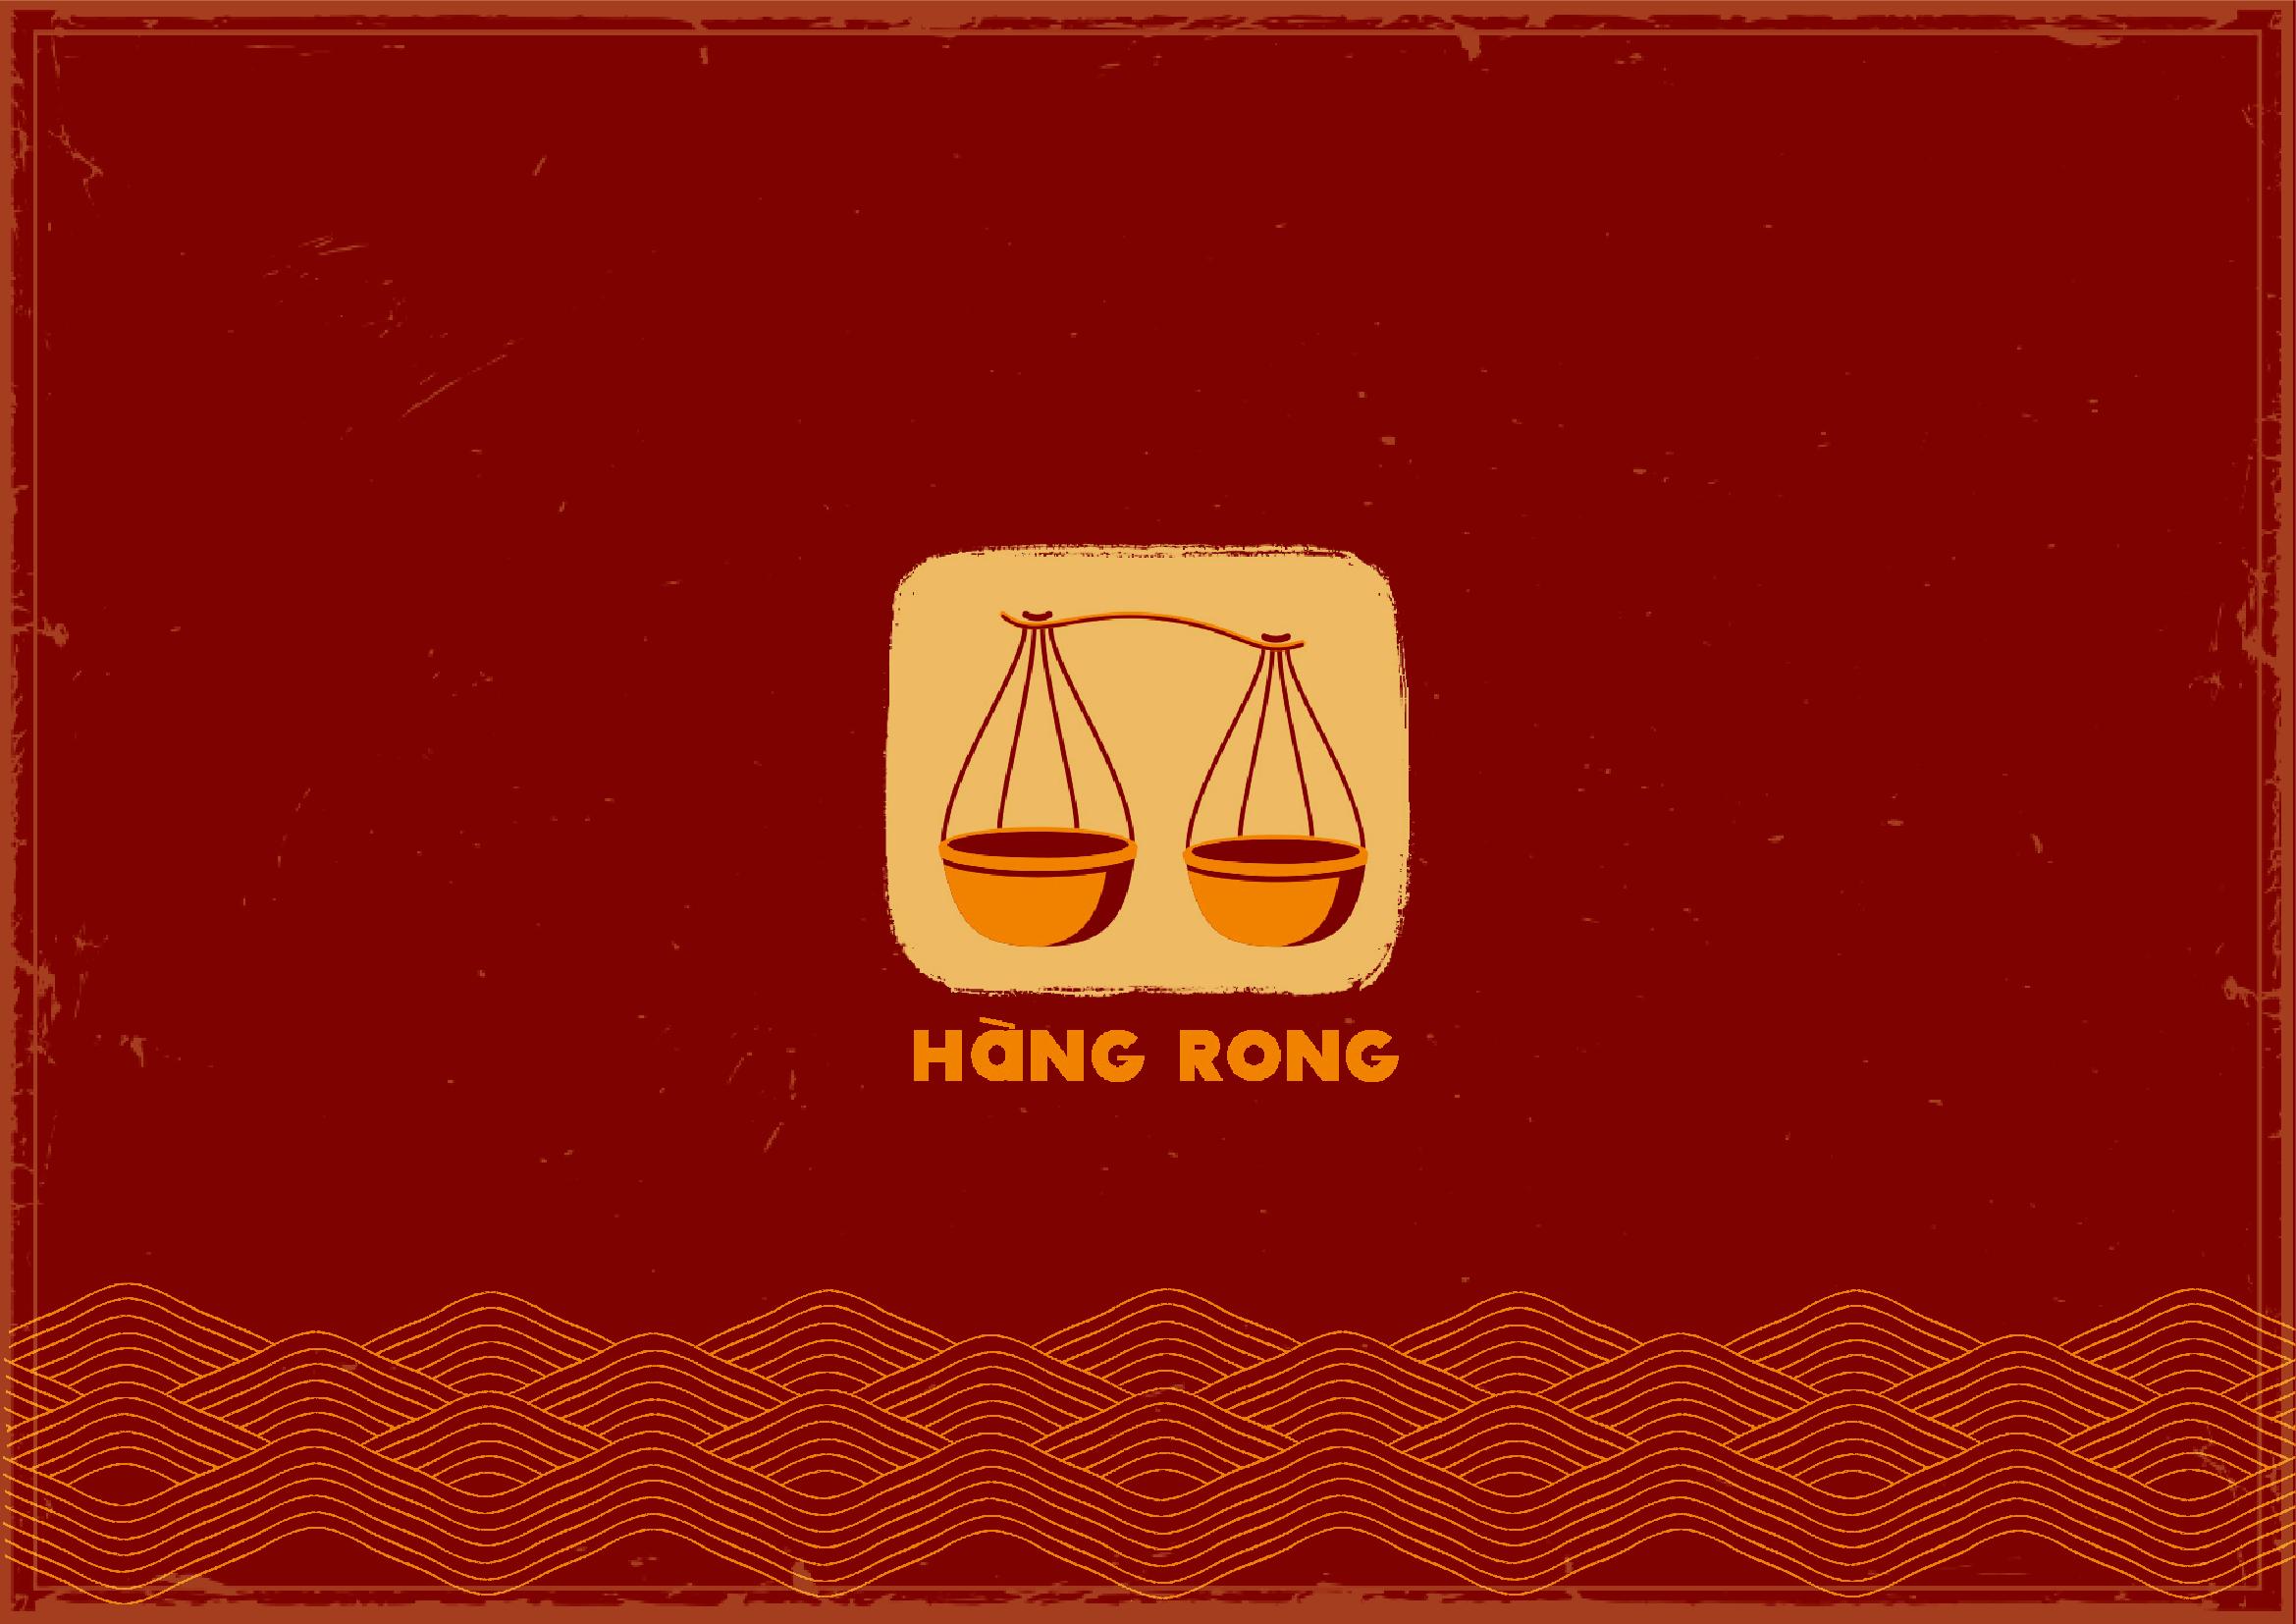 Project sem 1 | HÀNG RONG | Lớp A1.2009.M0